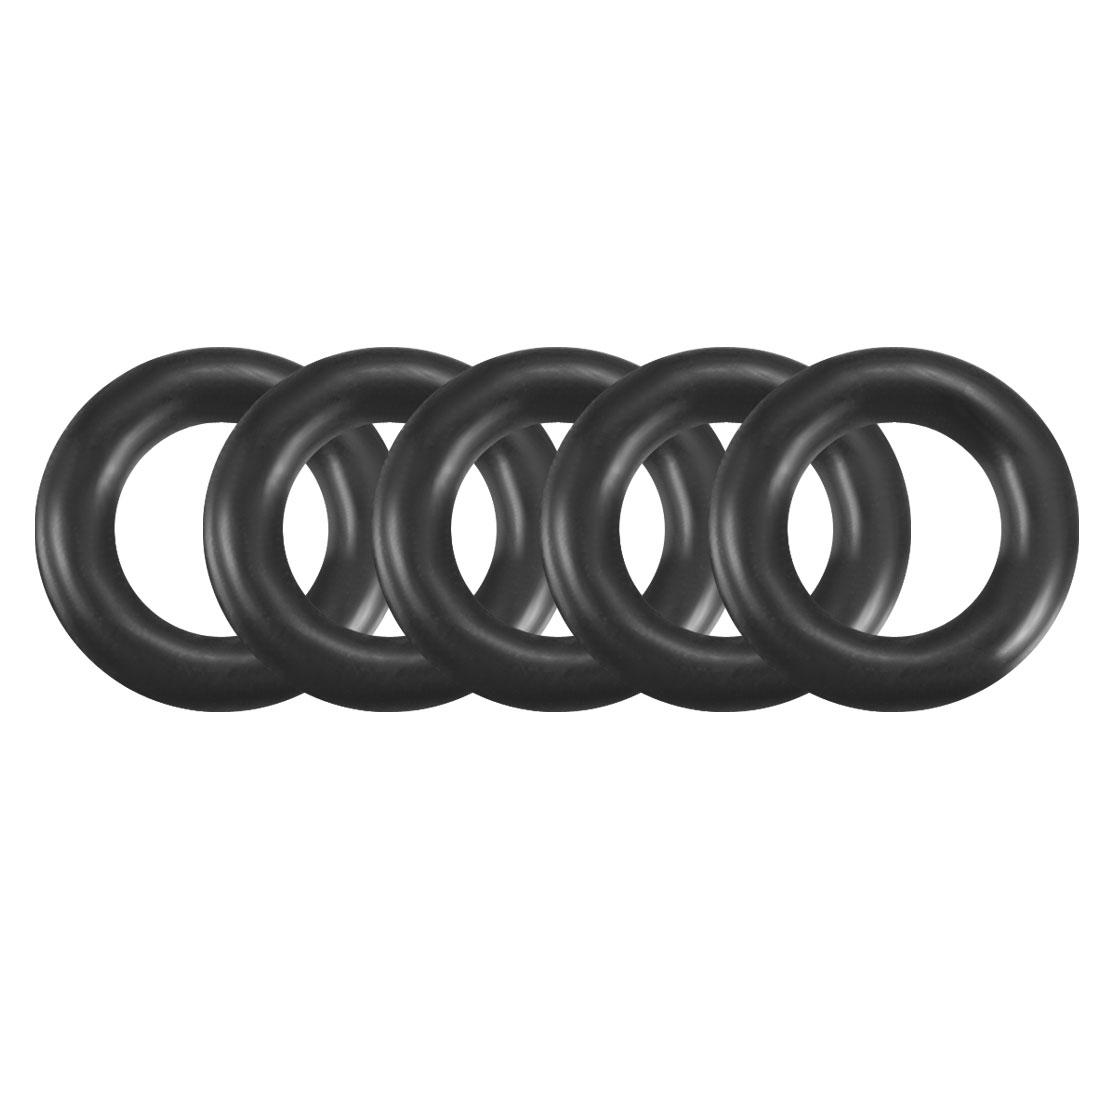 100Pcs Black 5.5mm x 1.2mm Nitrile Rubber O Ring NBR Oil Sealing Grommets